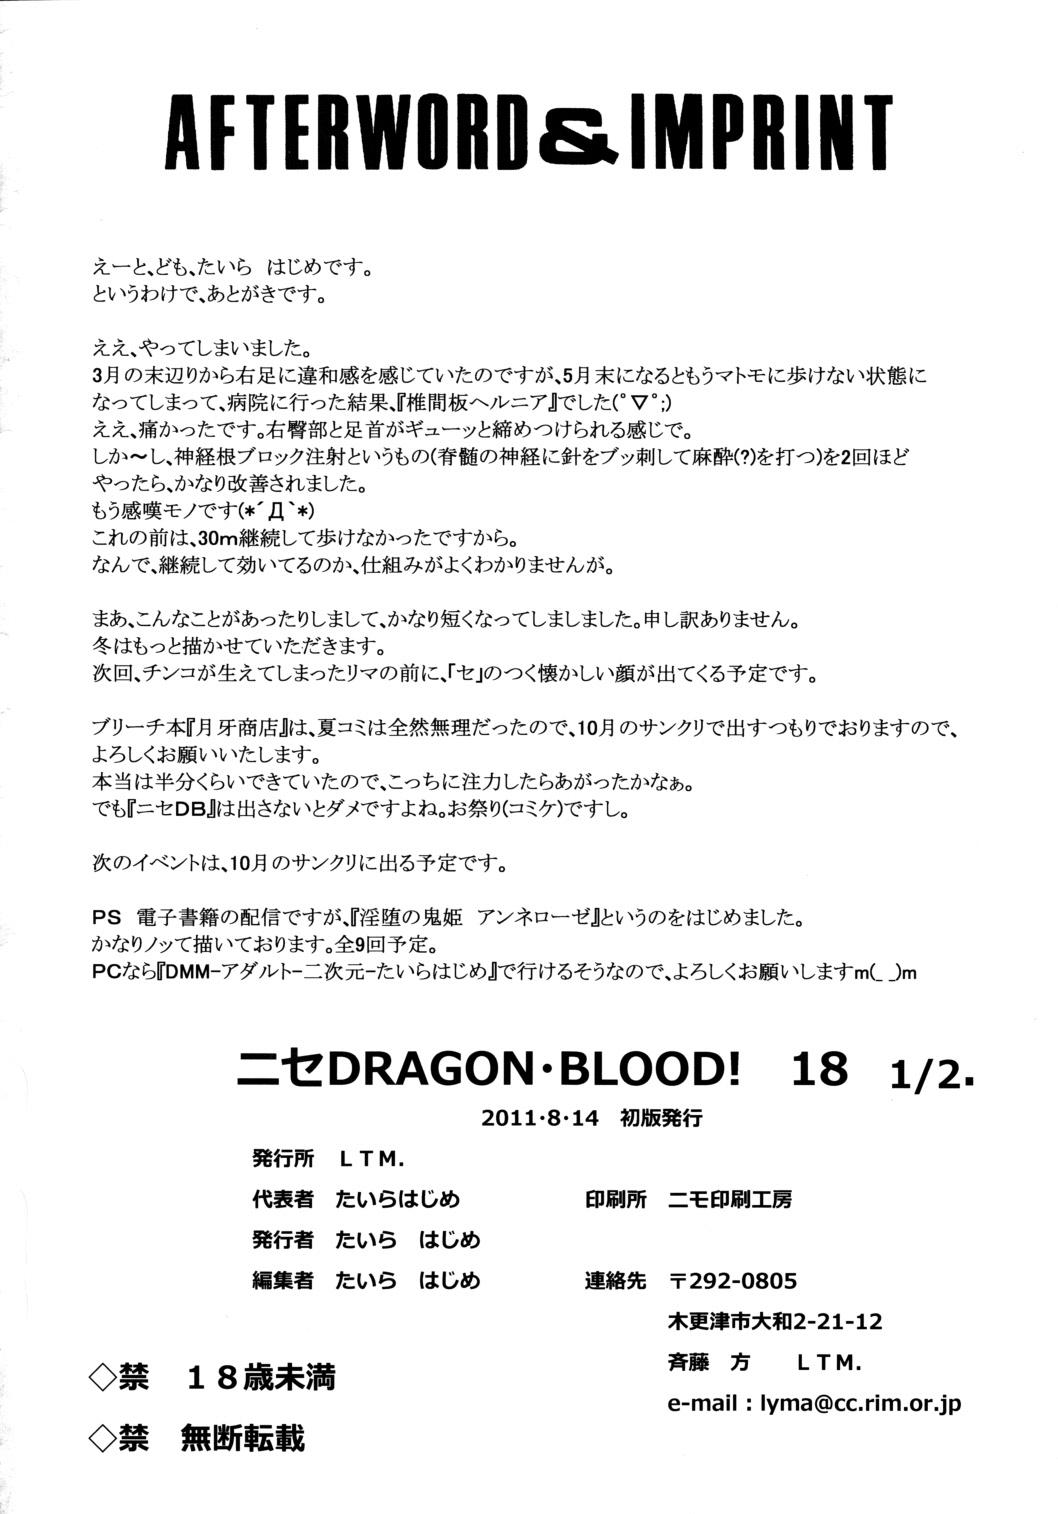 Nise DRAGON BLOOD! 18 1/2 25